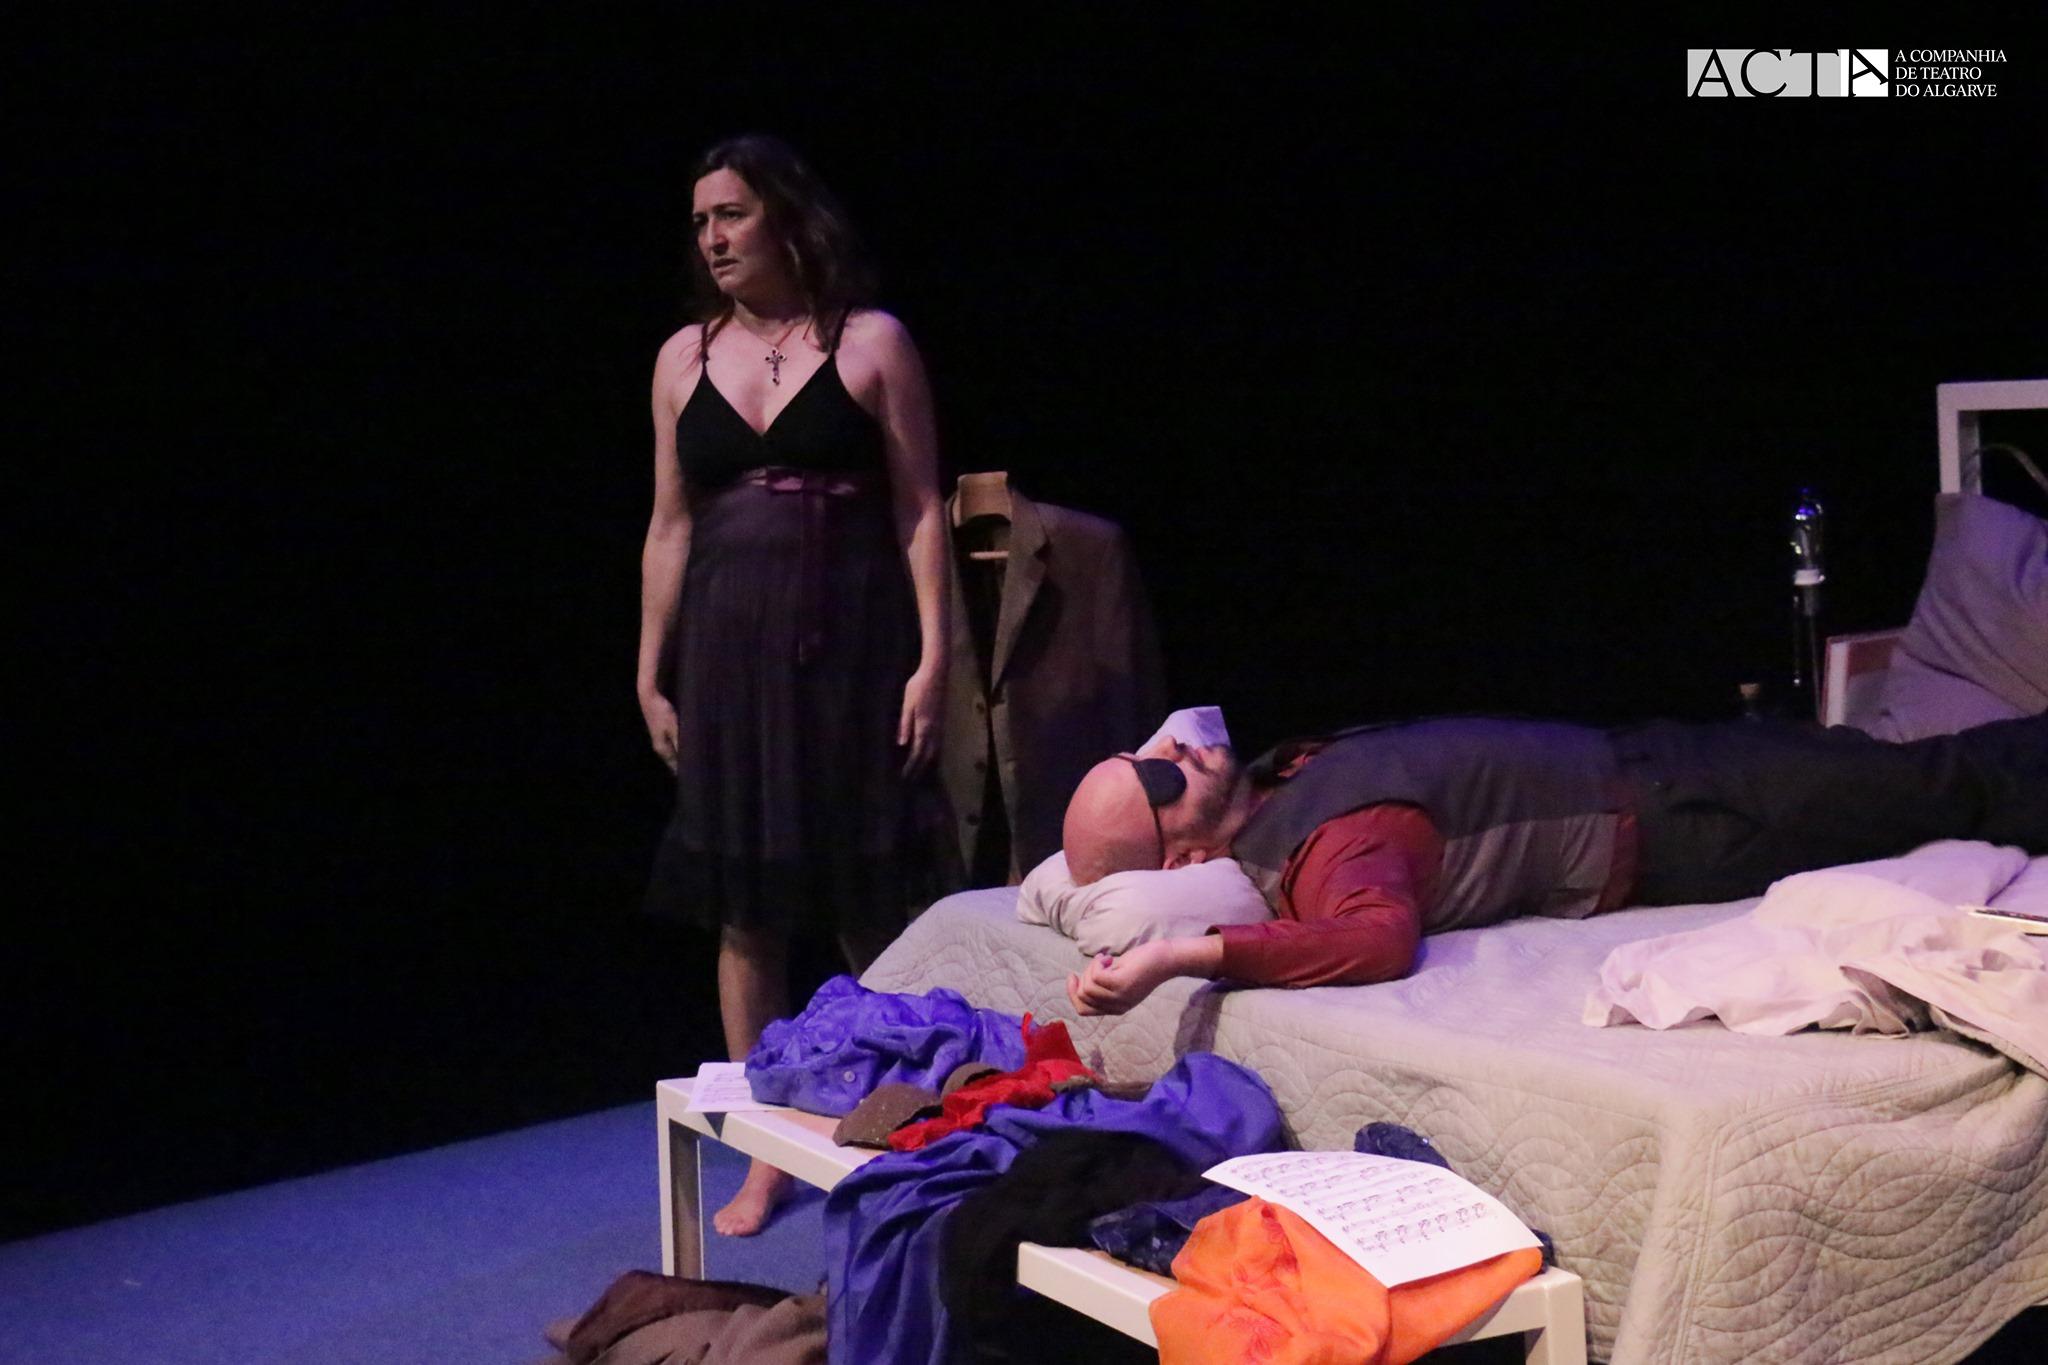 'A Noite de Molly Bloom' - Acta - Companhia de Teatro do Algarve